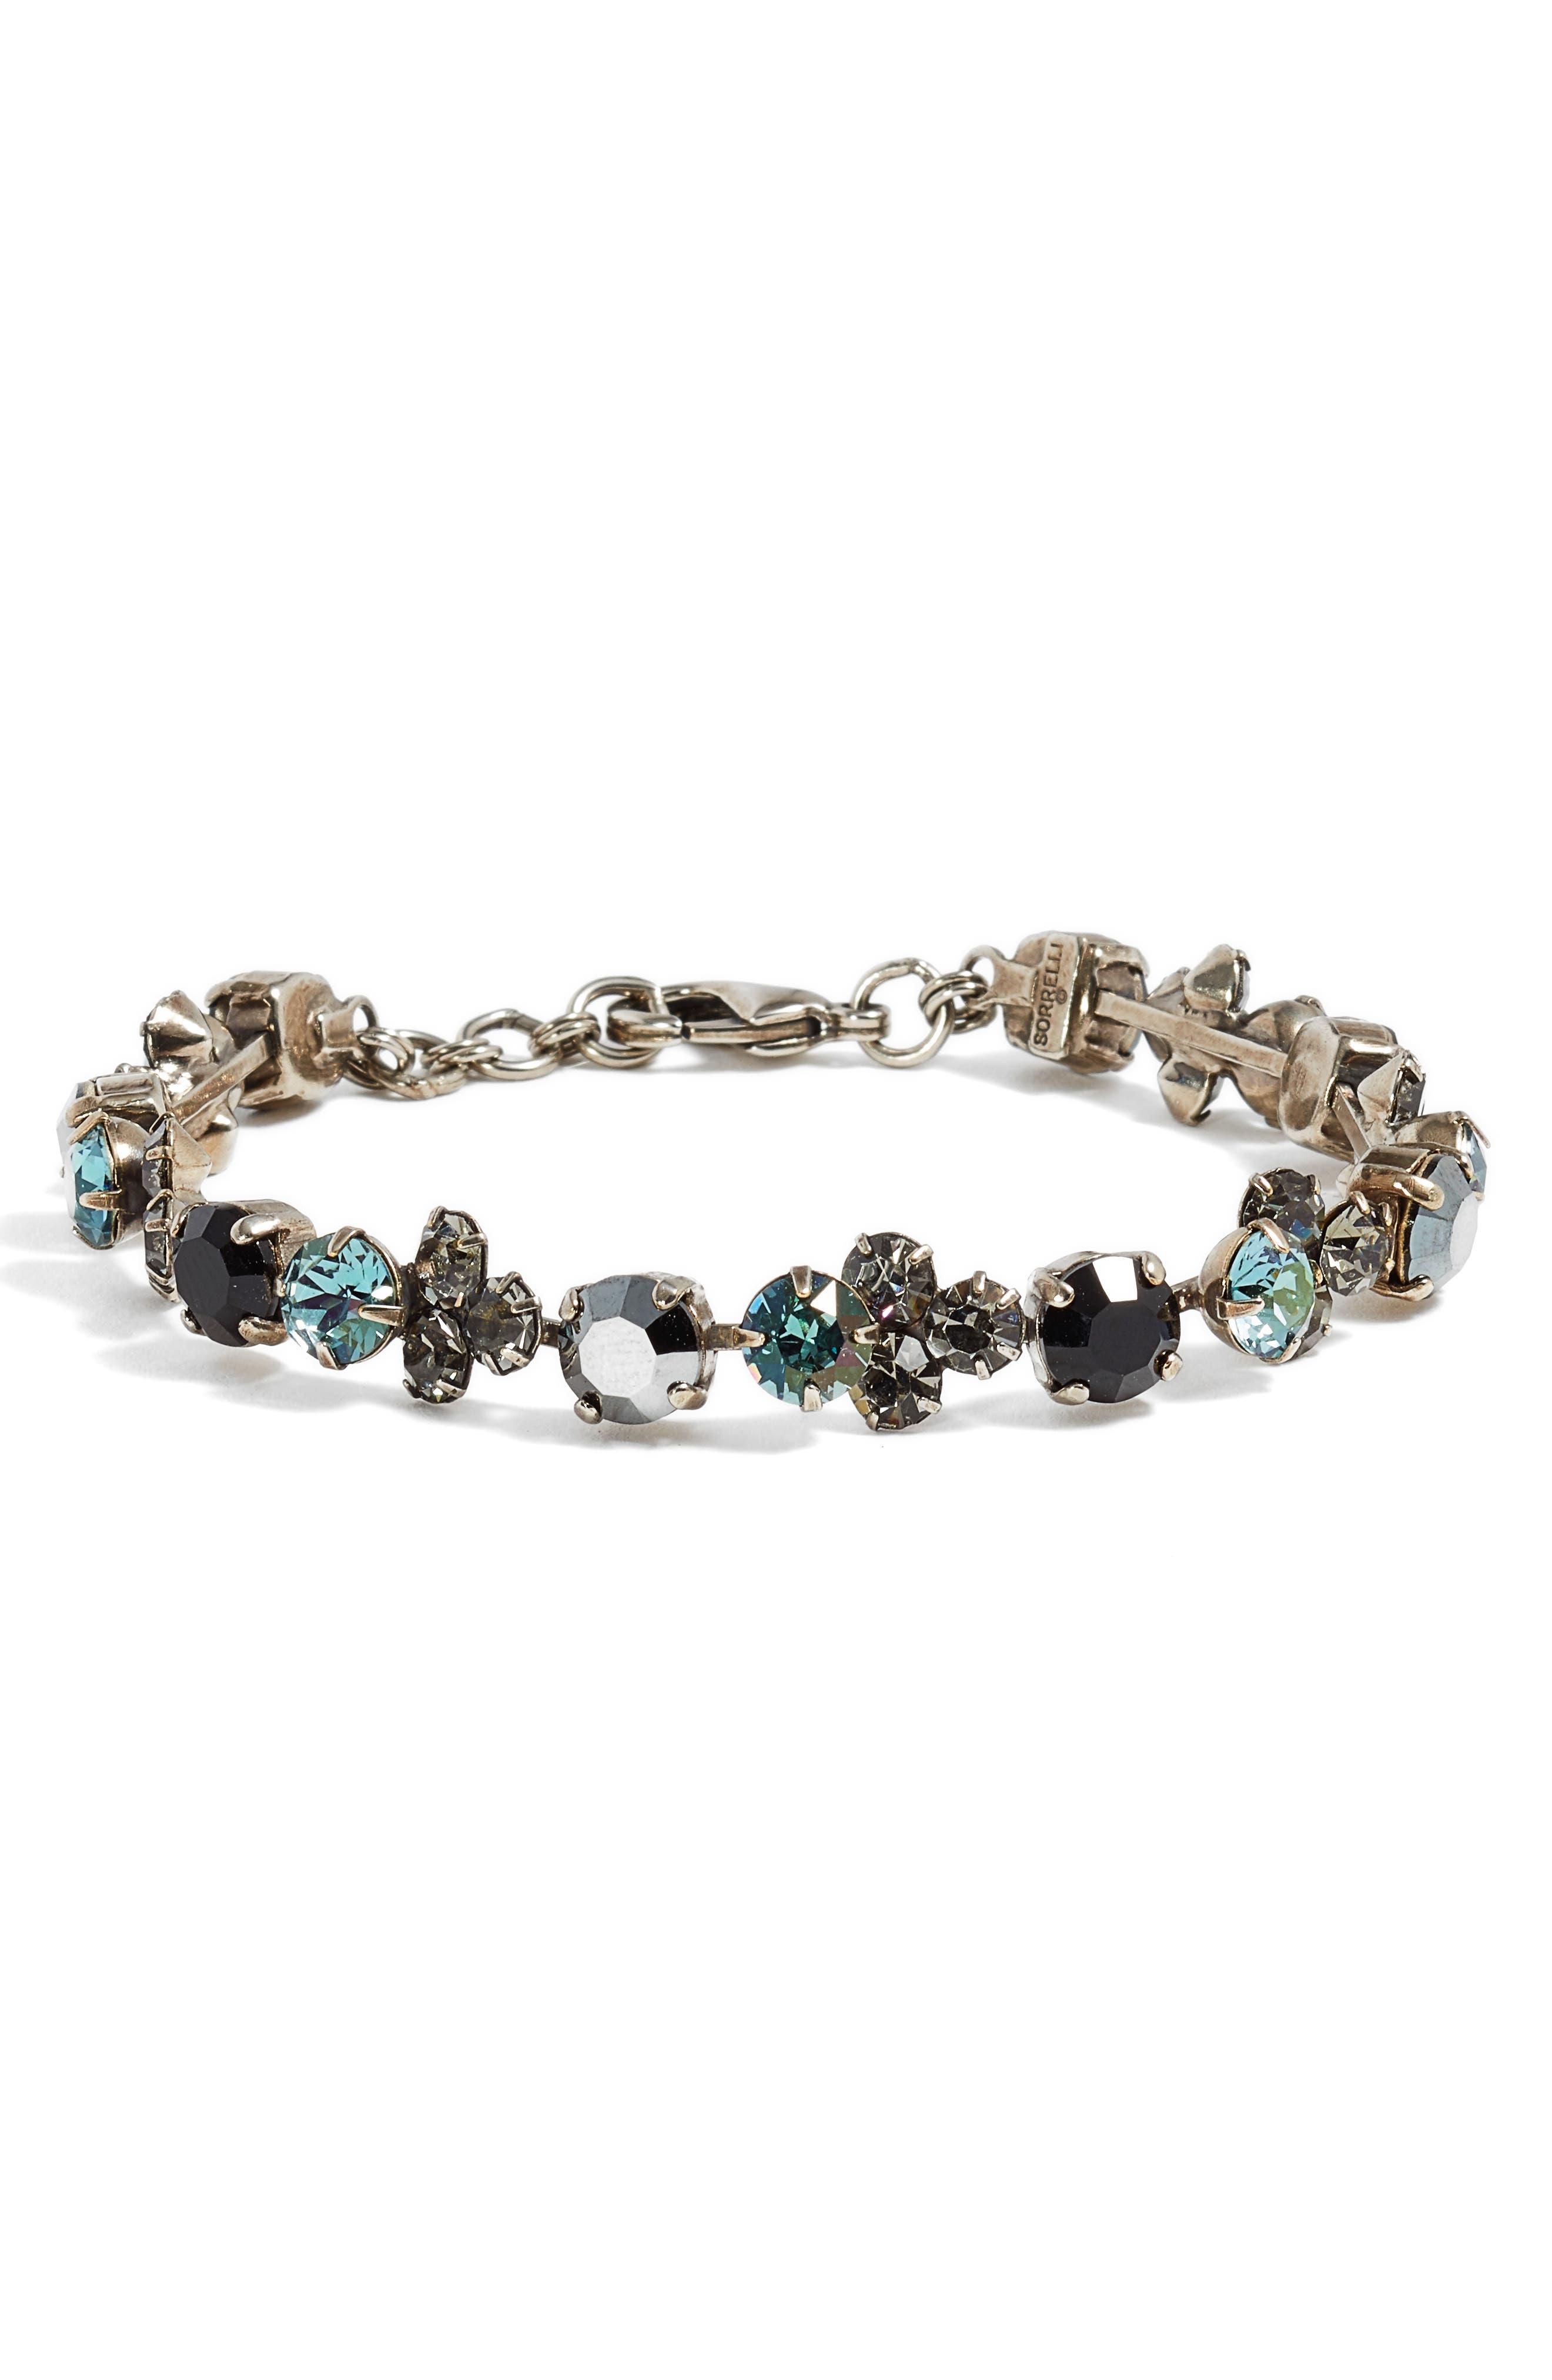 Main Image - Sorrelli Wisteria Bracelet